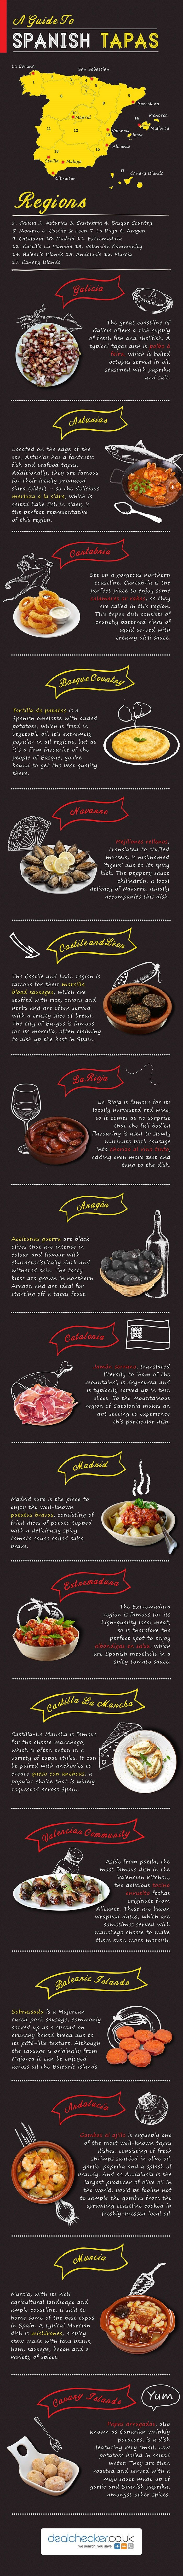 A Guide To Spanish Tapas #infographic #Food #SpanishTapas